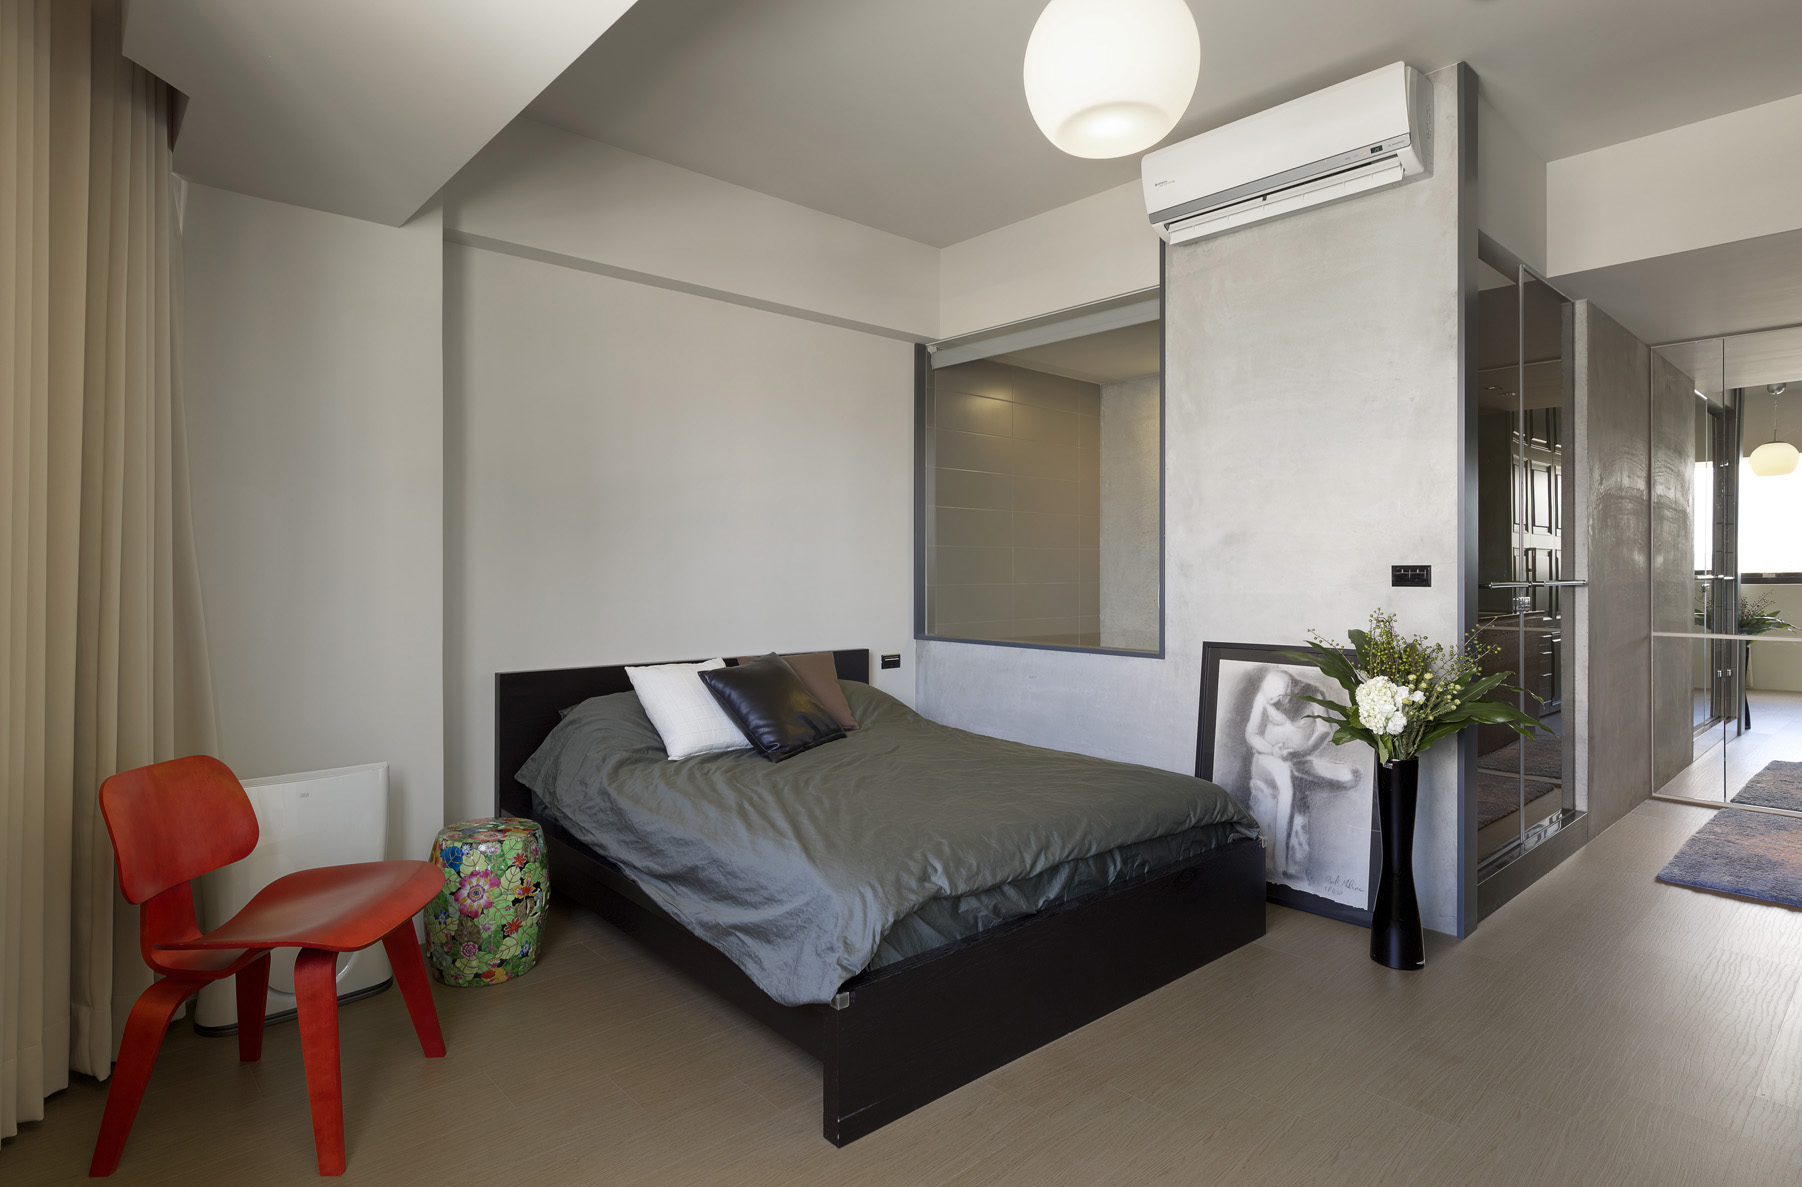 12 minimalist master bedroom | Interior Design Ideas. on Bedroom Minimalist Design  id=85097